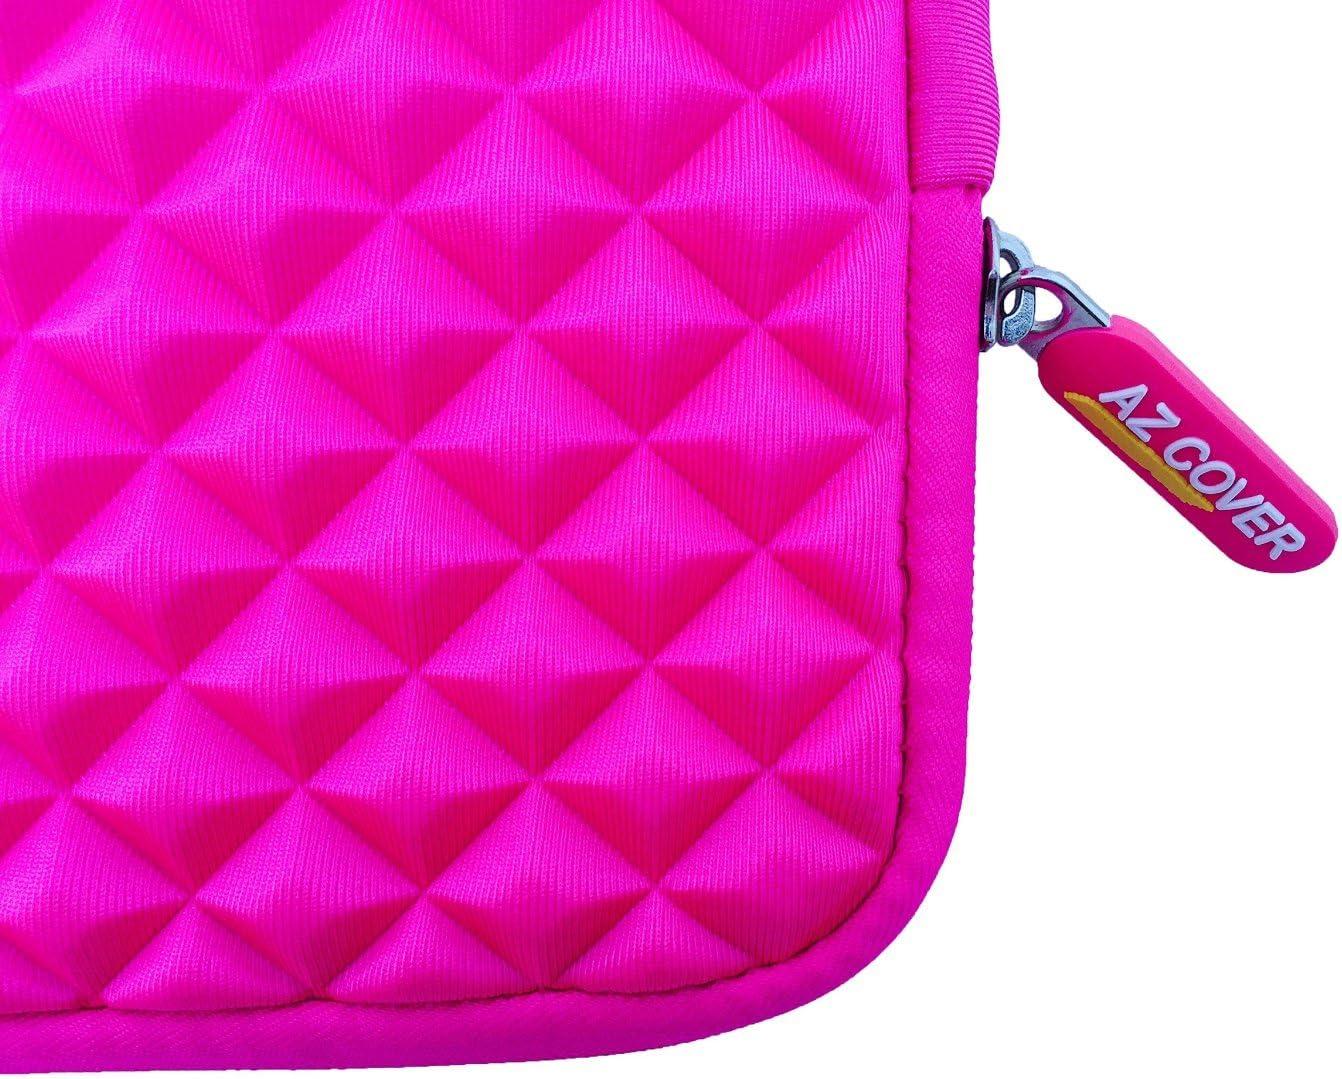 Hot Pink 13-j002dx AZ-Cover 13.3-Inch Case Simplicity /& Stylish Diamond Foam Shock-Resistant Neoprene Sleeve For HP ENVY x2 Detachable PC 13.3-inch